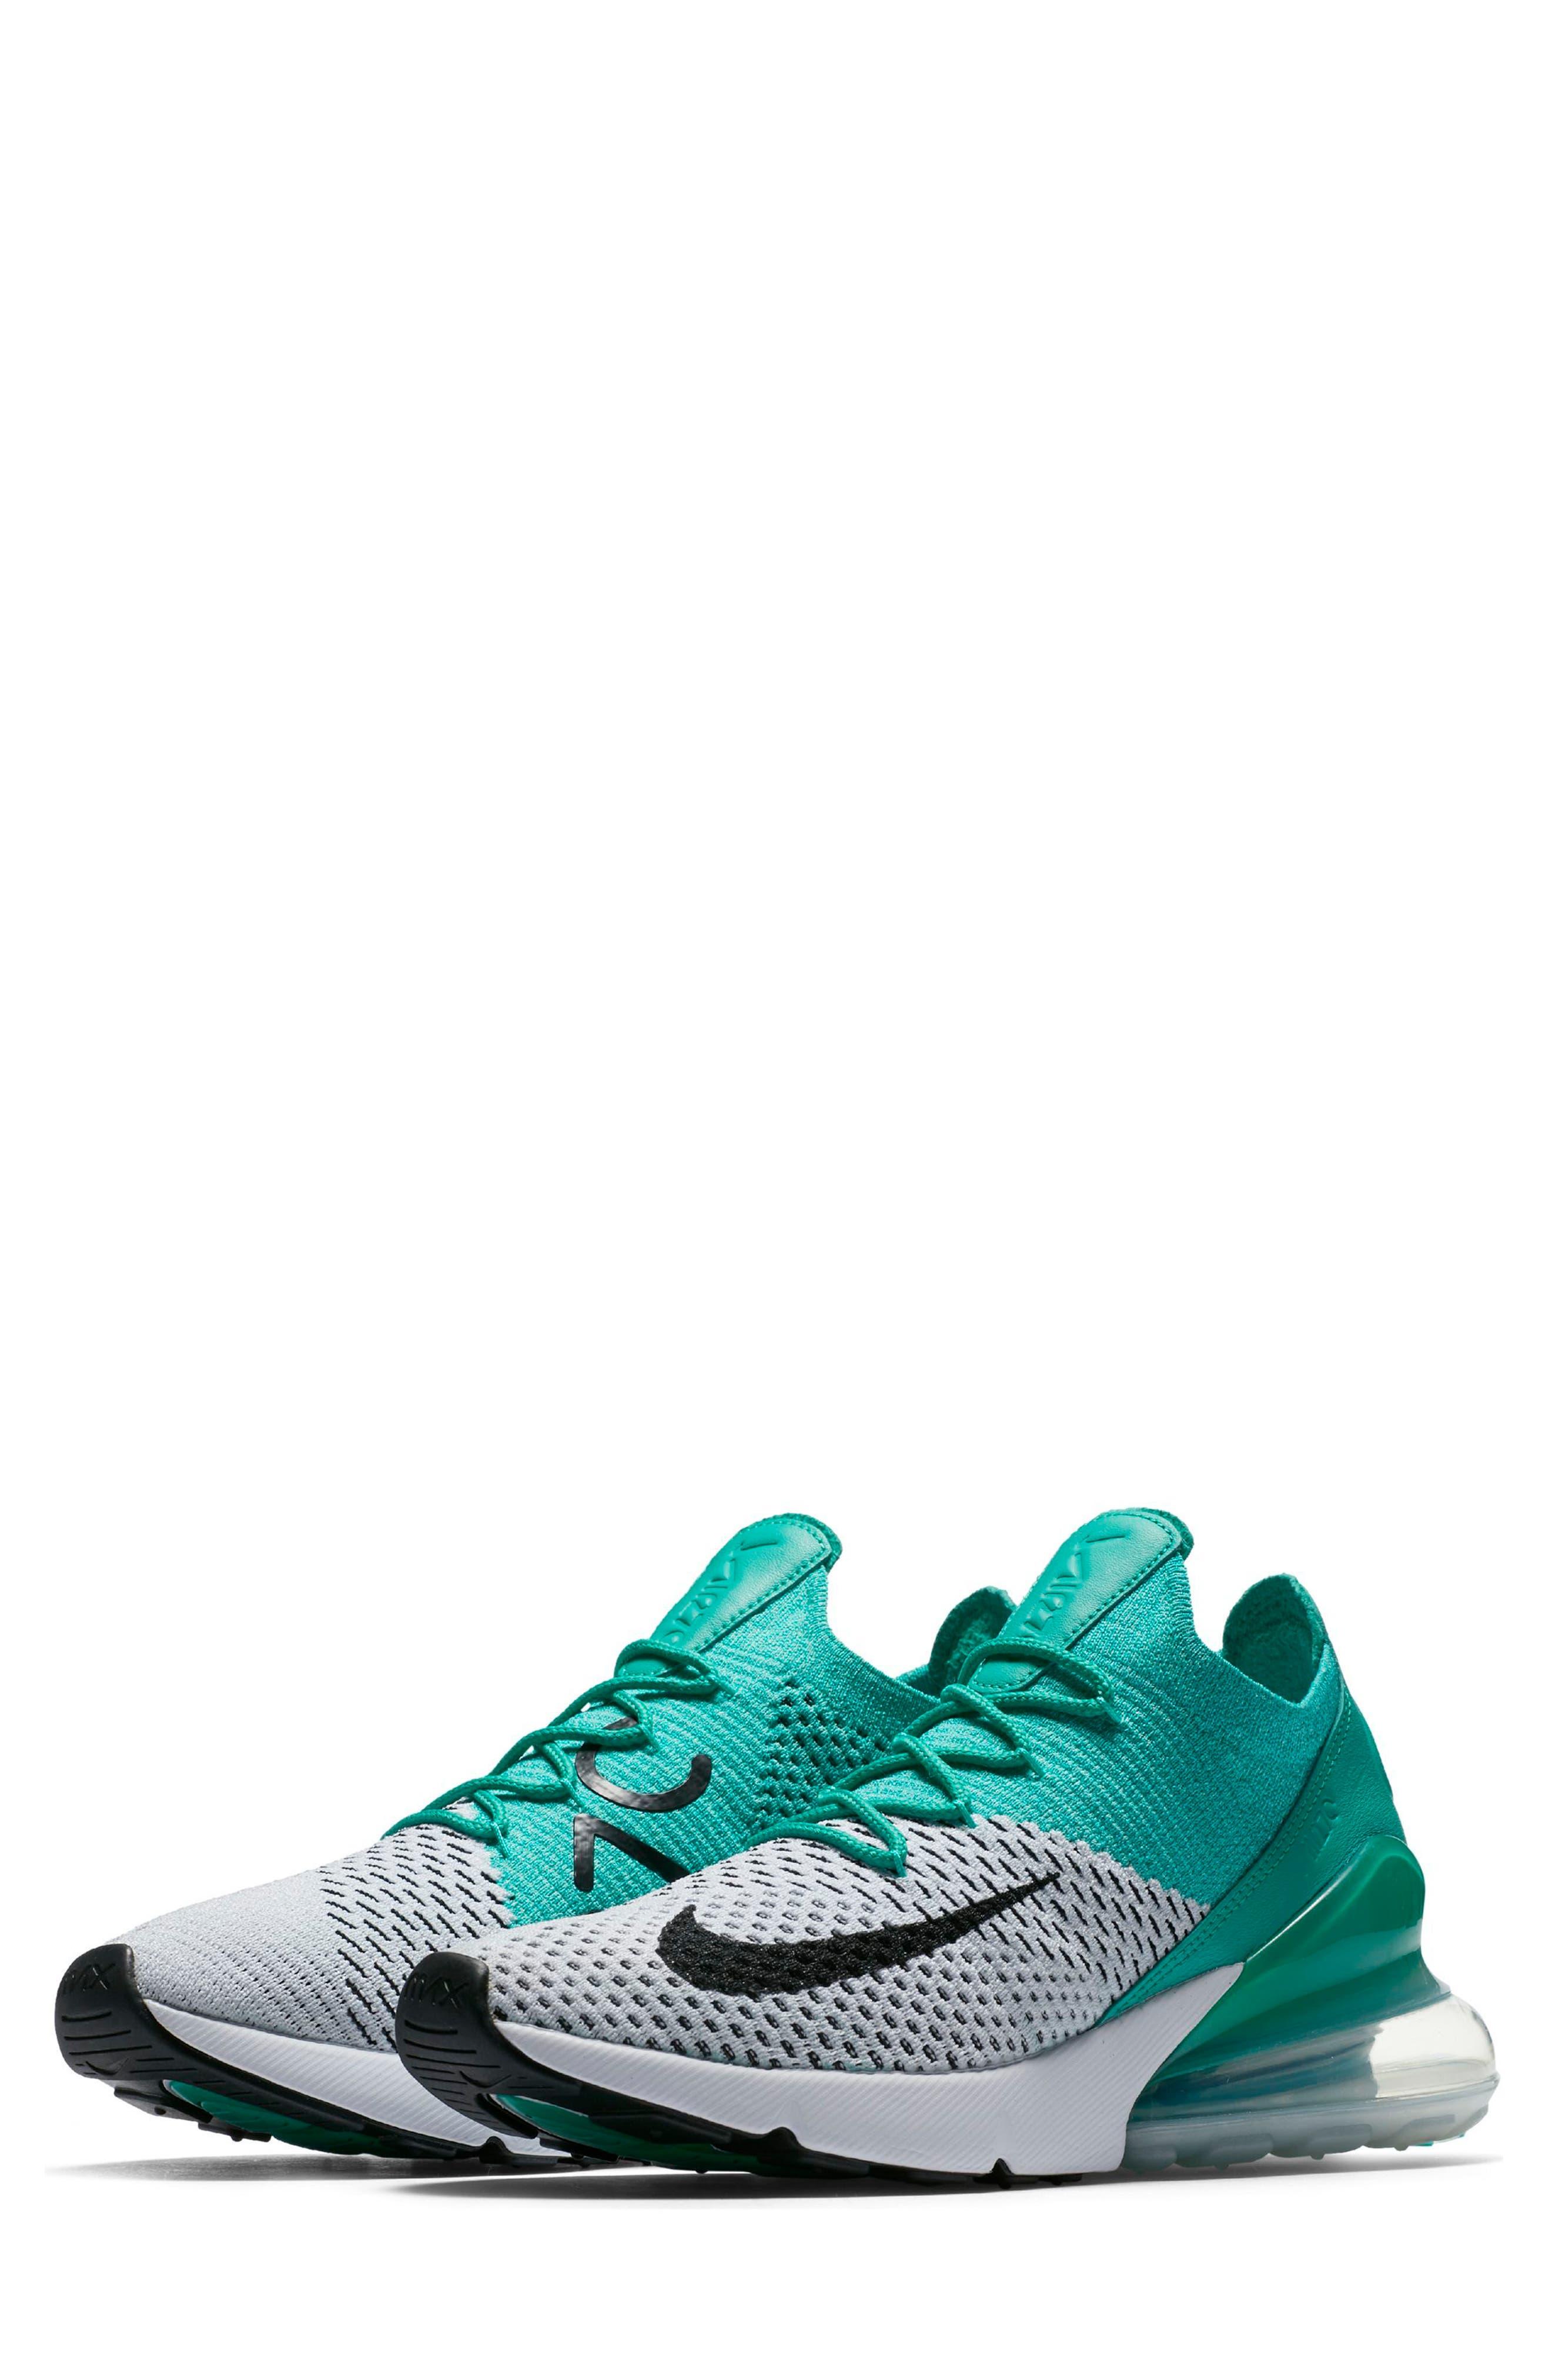 Air Max 270 Flyknit Sneaker,                             Main thumbnail 1, color,                             EMERALD/ BLACK/ PURE PLATINUM